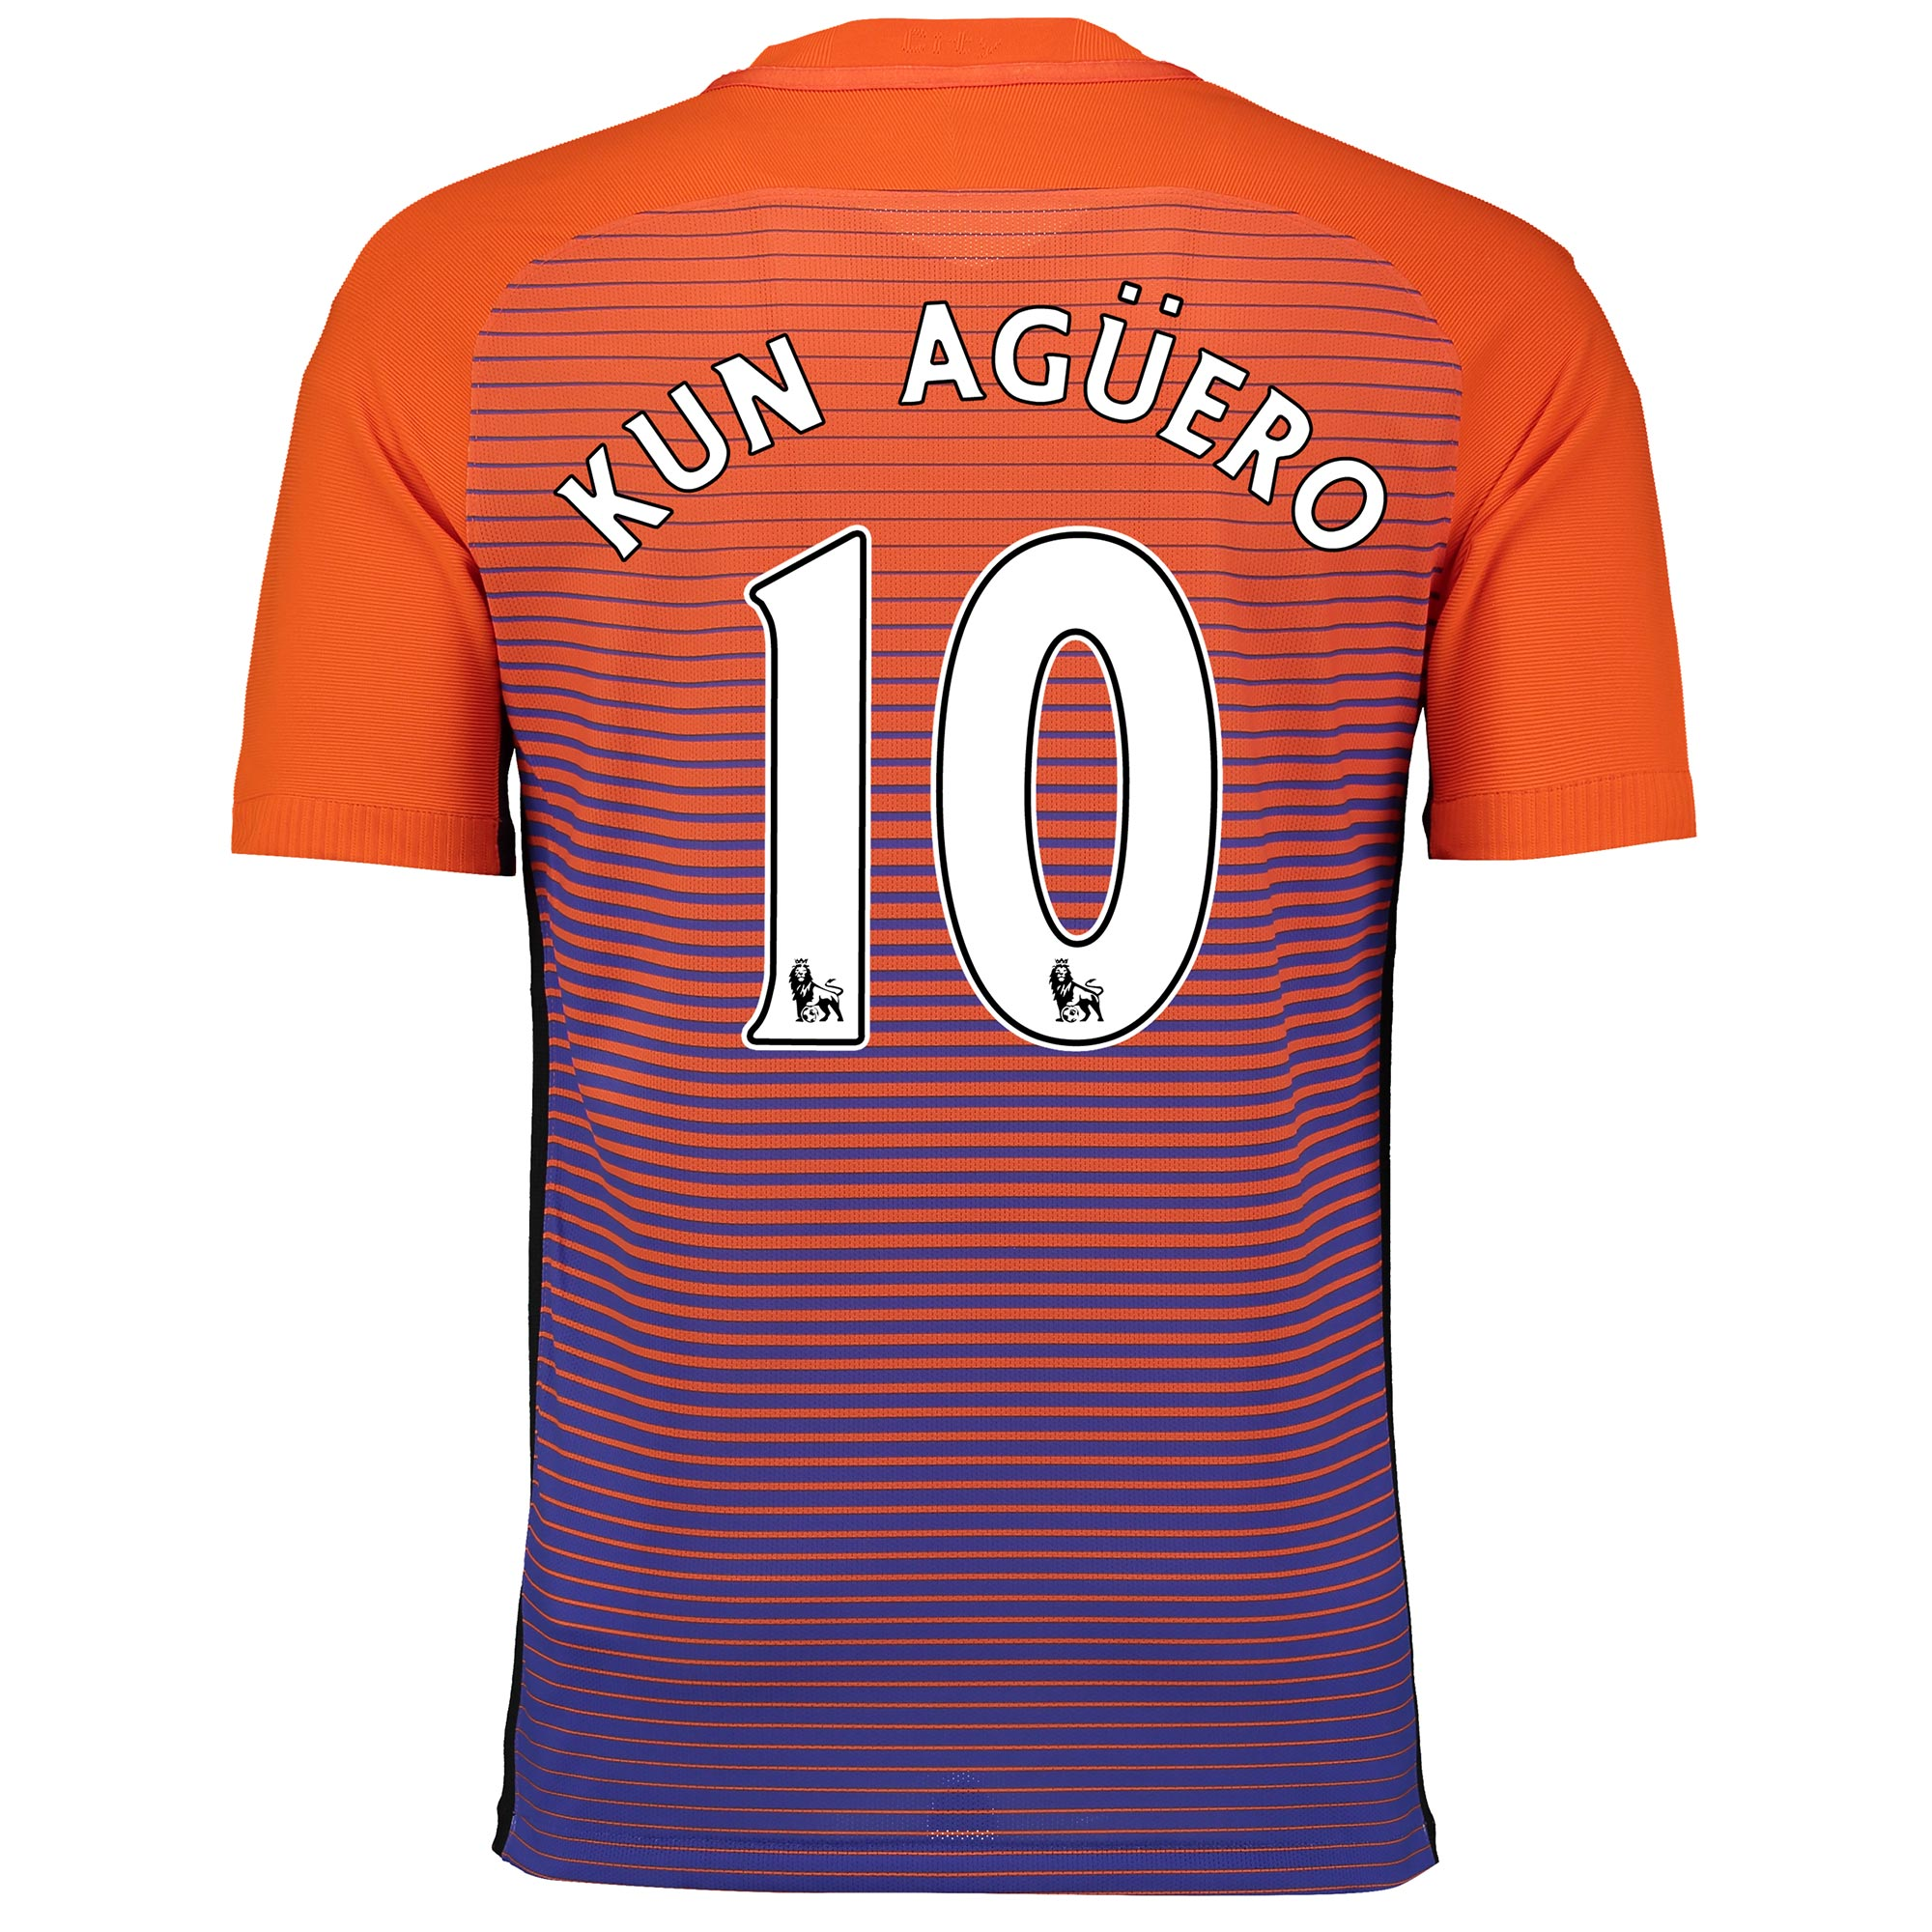 Manchester City Third Vapor Match Shirt 2016-17 with Kun Ag??ero  10 pr